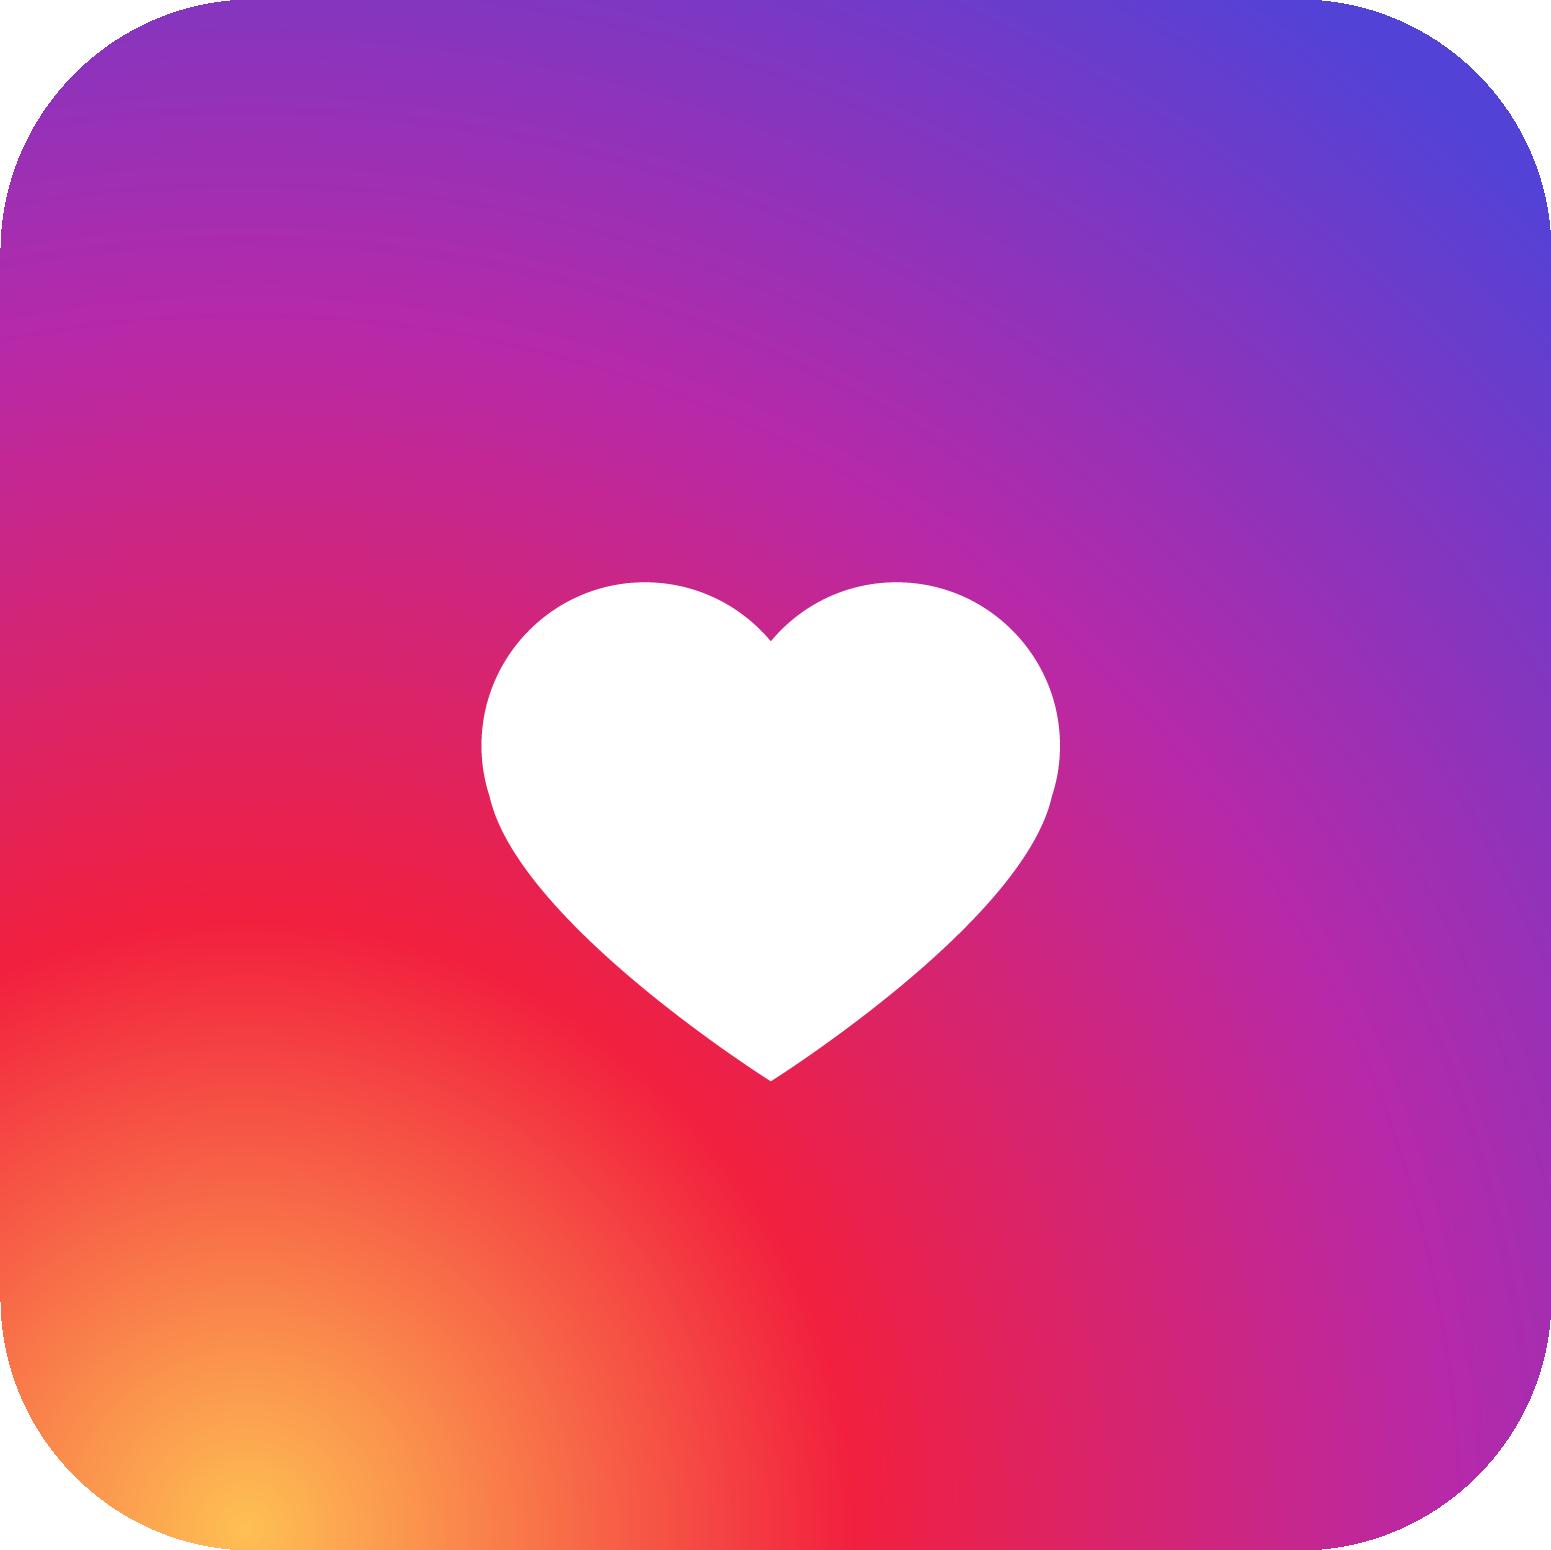 Instagram Heart PNG Images.